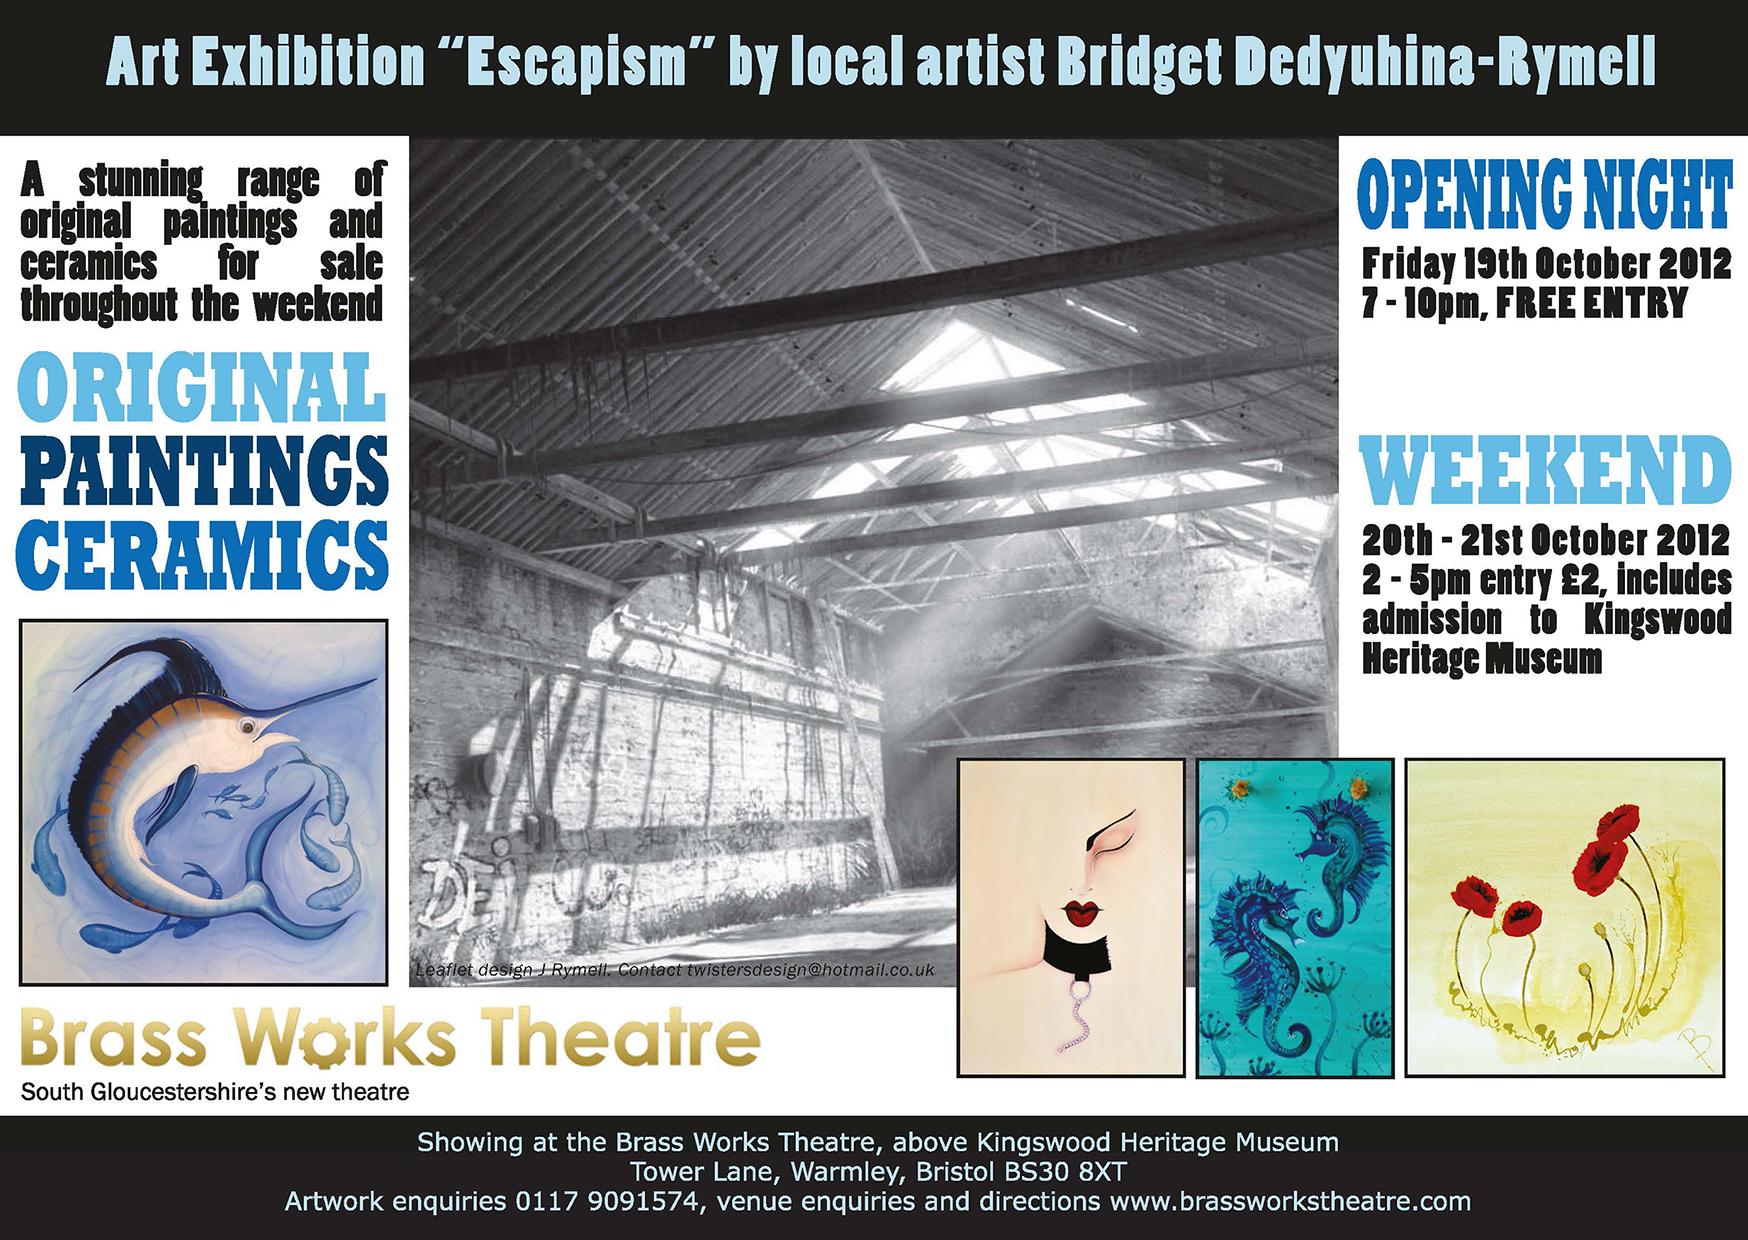 Escapism by Bridget Dedyuhina-Rymell